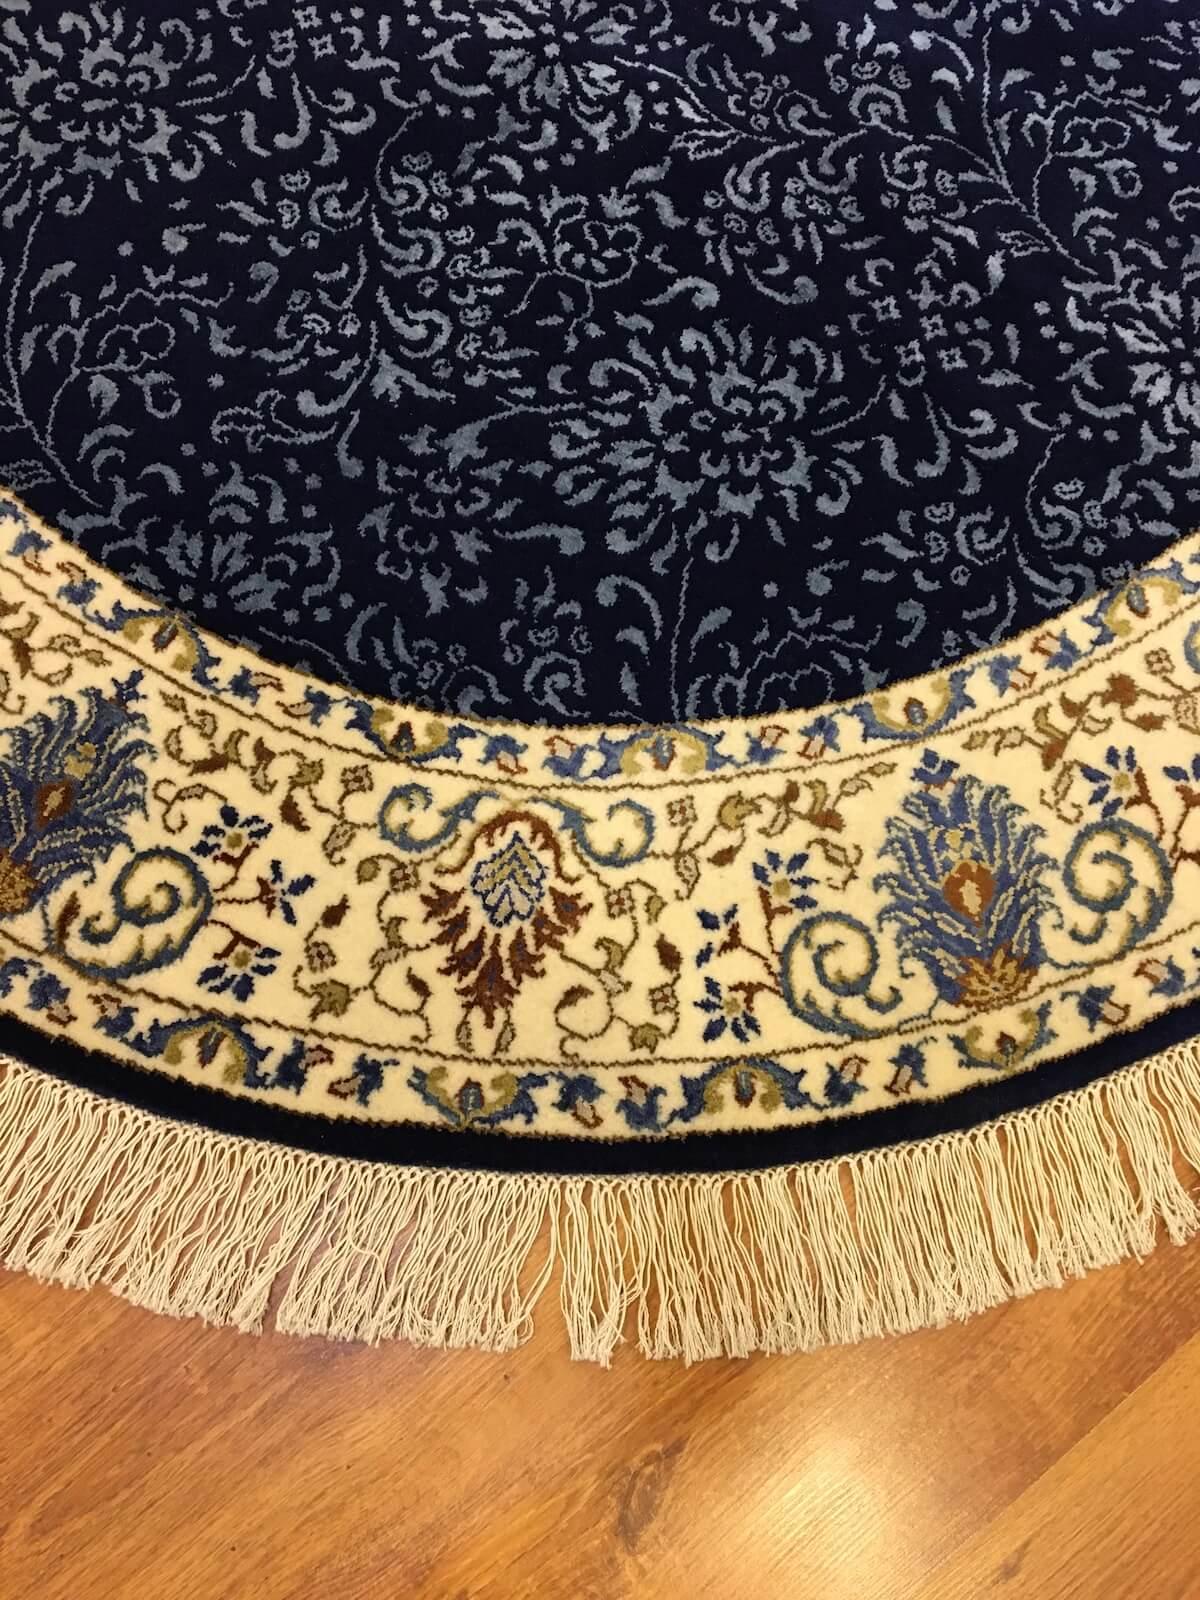 SULTANBEYLİ BUTİK HALI YUVARLAK 150X150 Sultanbeyli Butik Halı